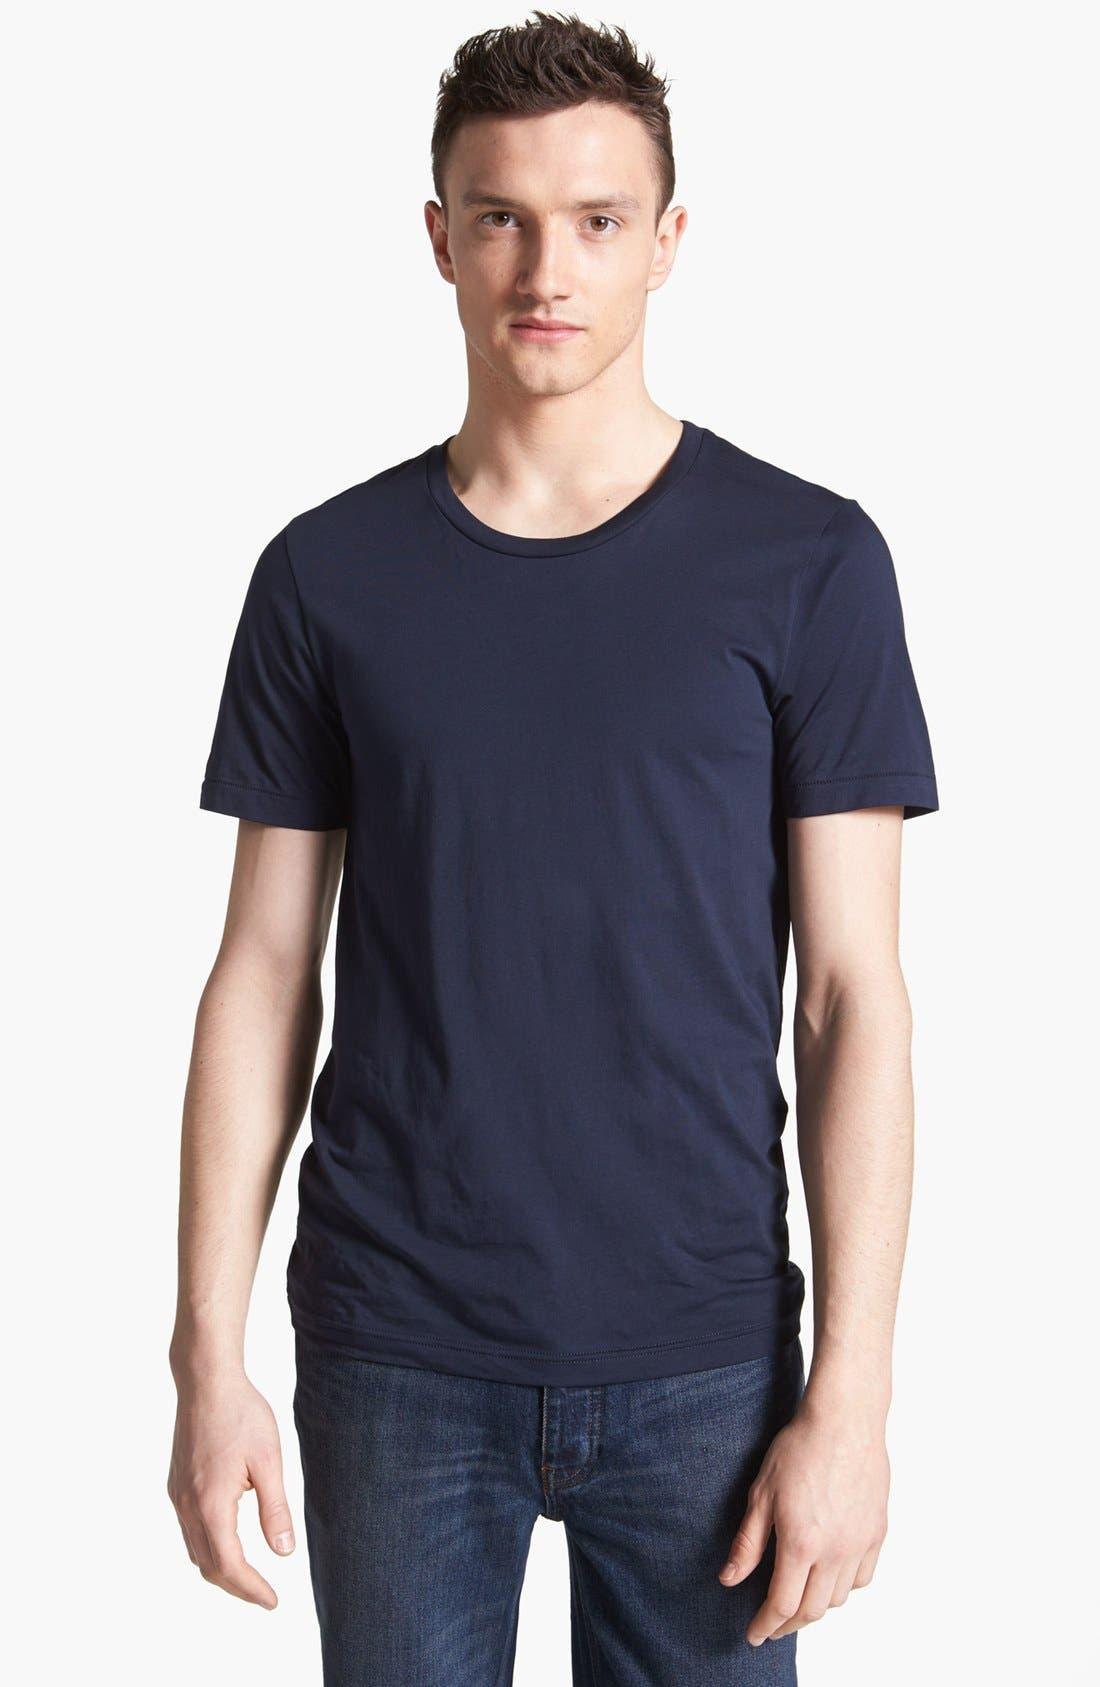 Alternate Image 1 Selected - BLK DNM 'T-Shirt 3' Pima Cotton T-Shirt